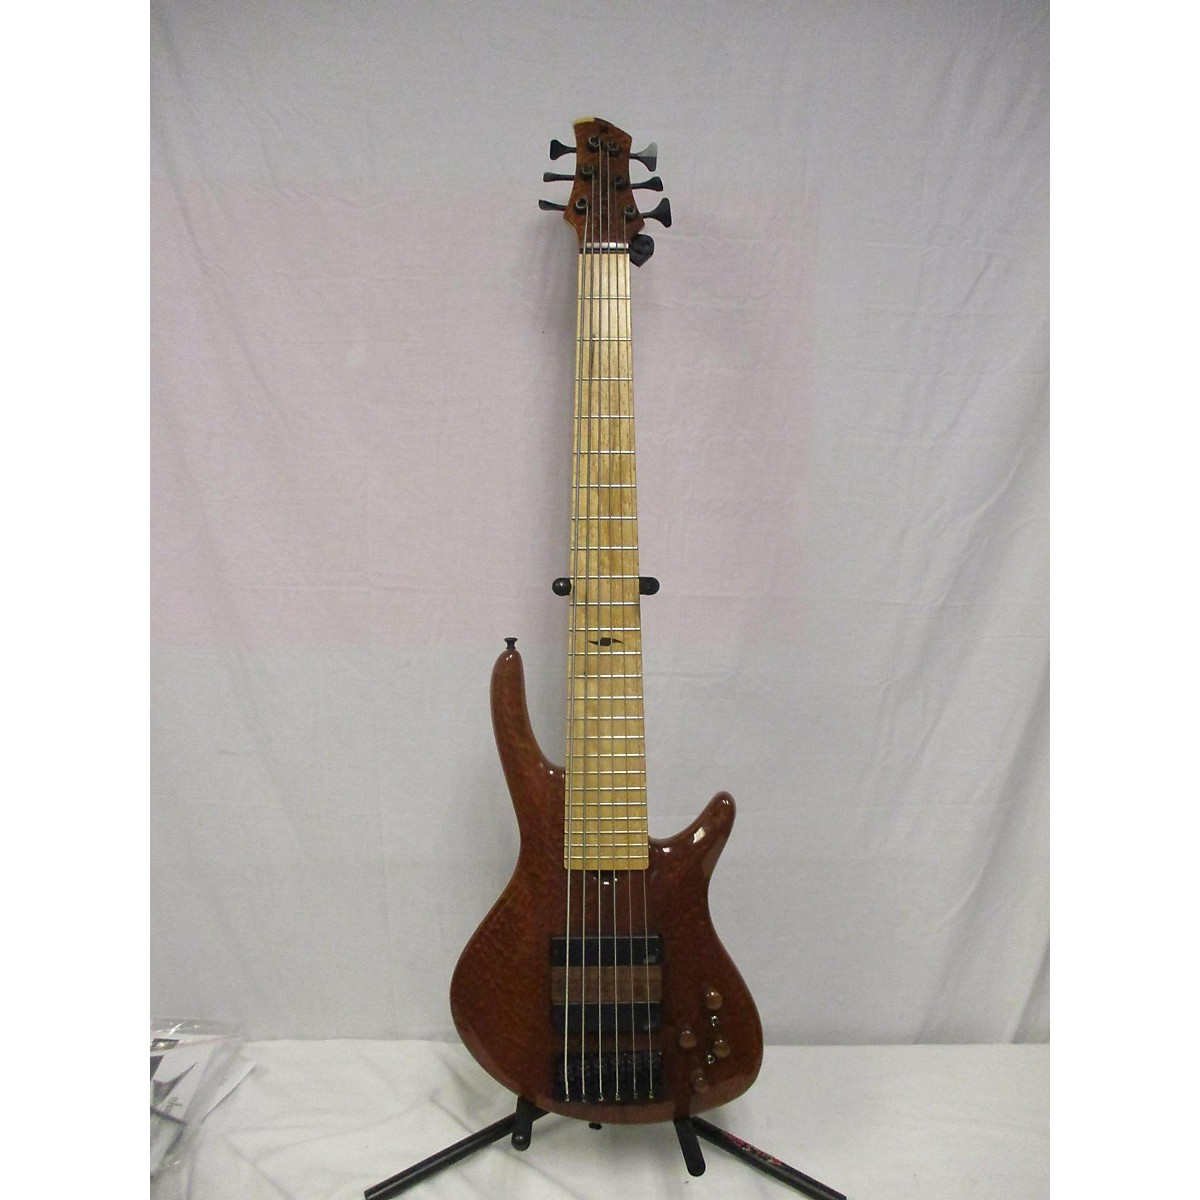 Roscoe Century Custom 6 String Electric Bass Guitar